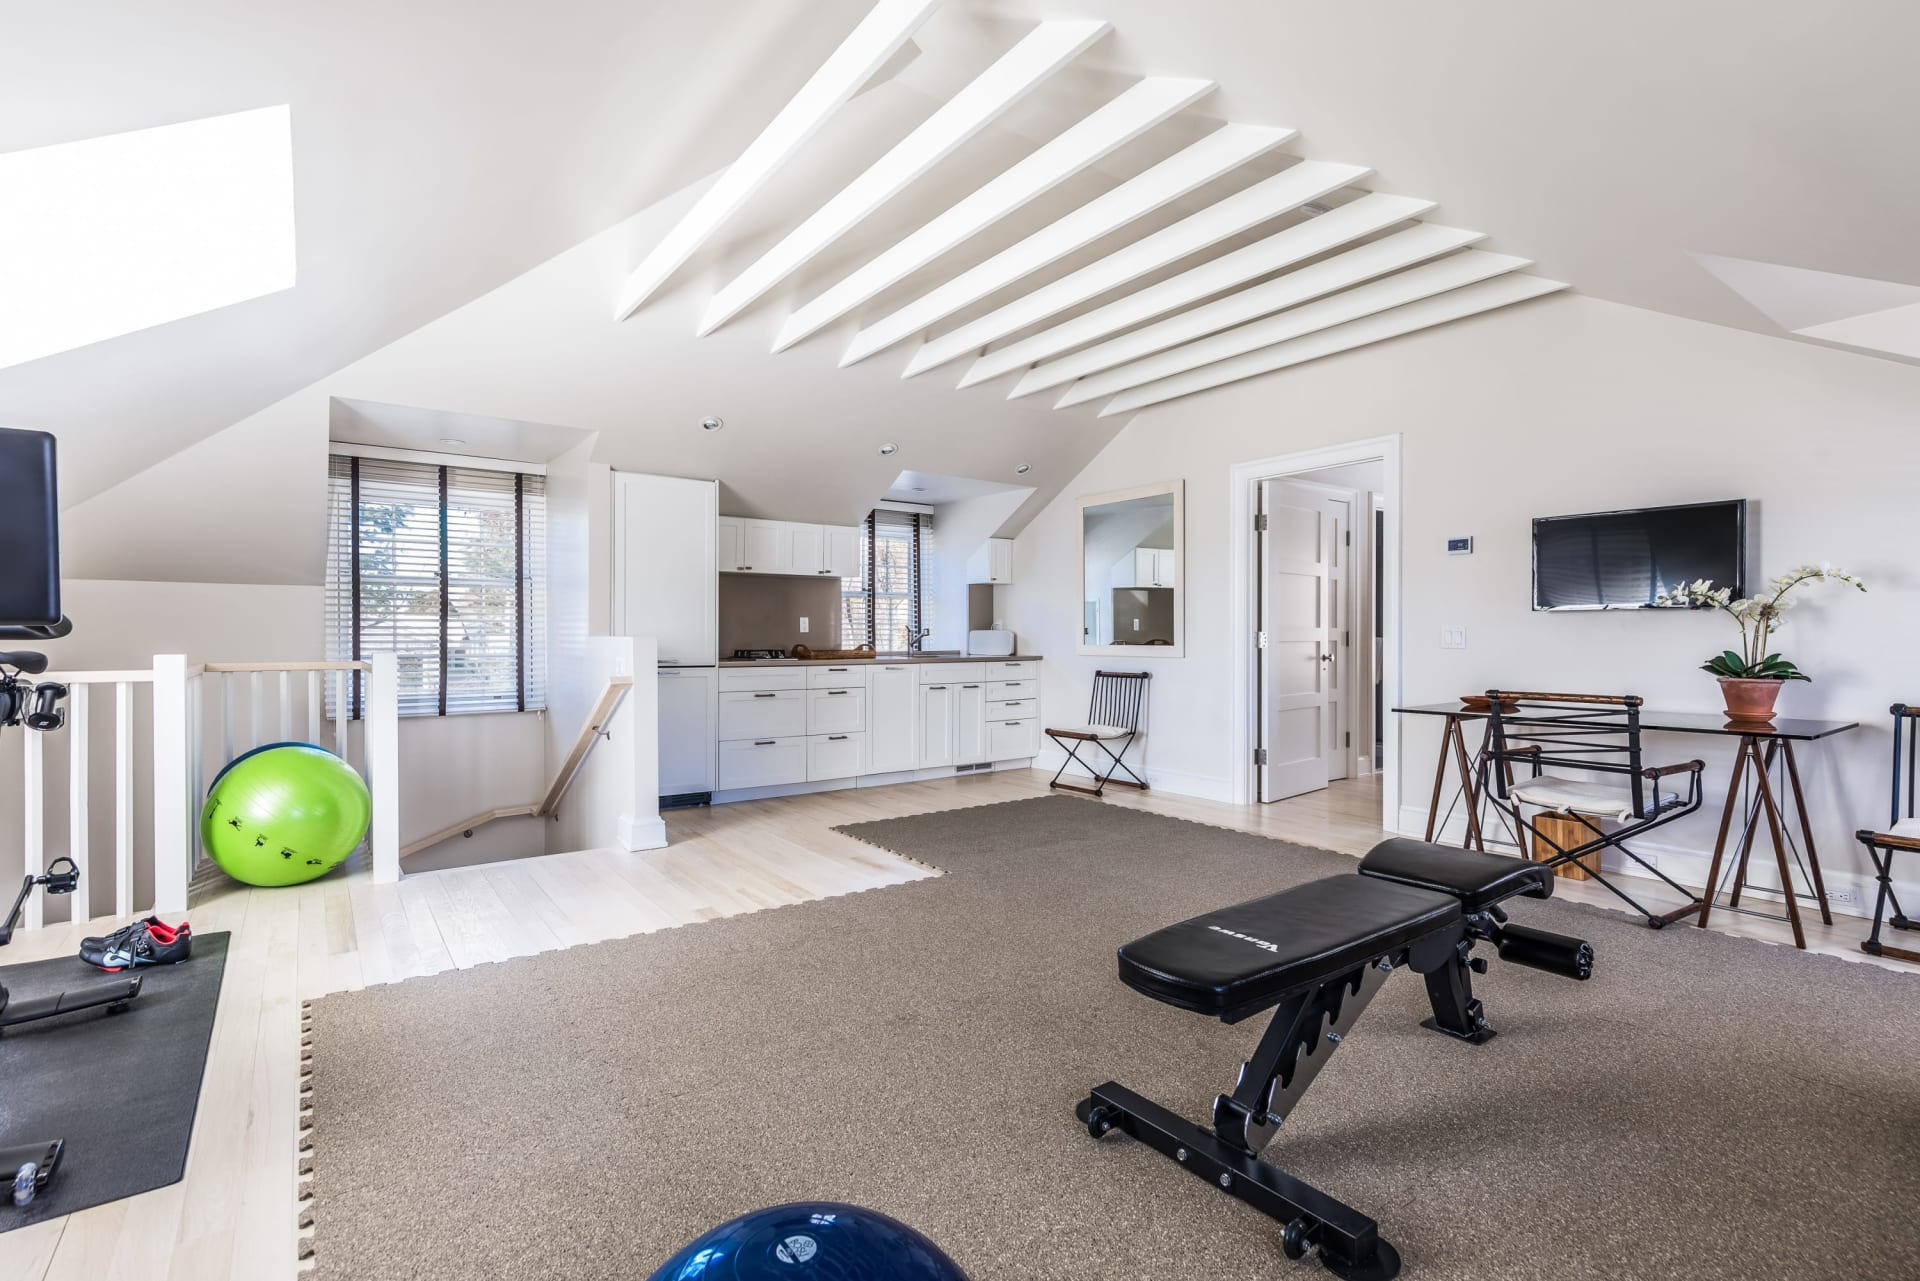 Architectural Digest Designer's Own East Hampton Home